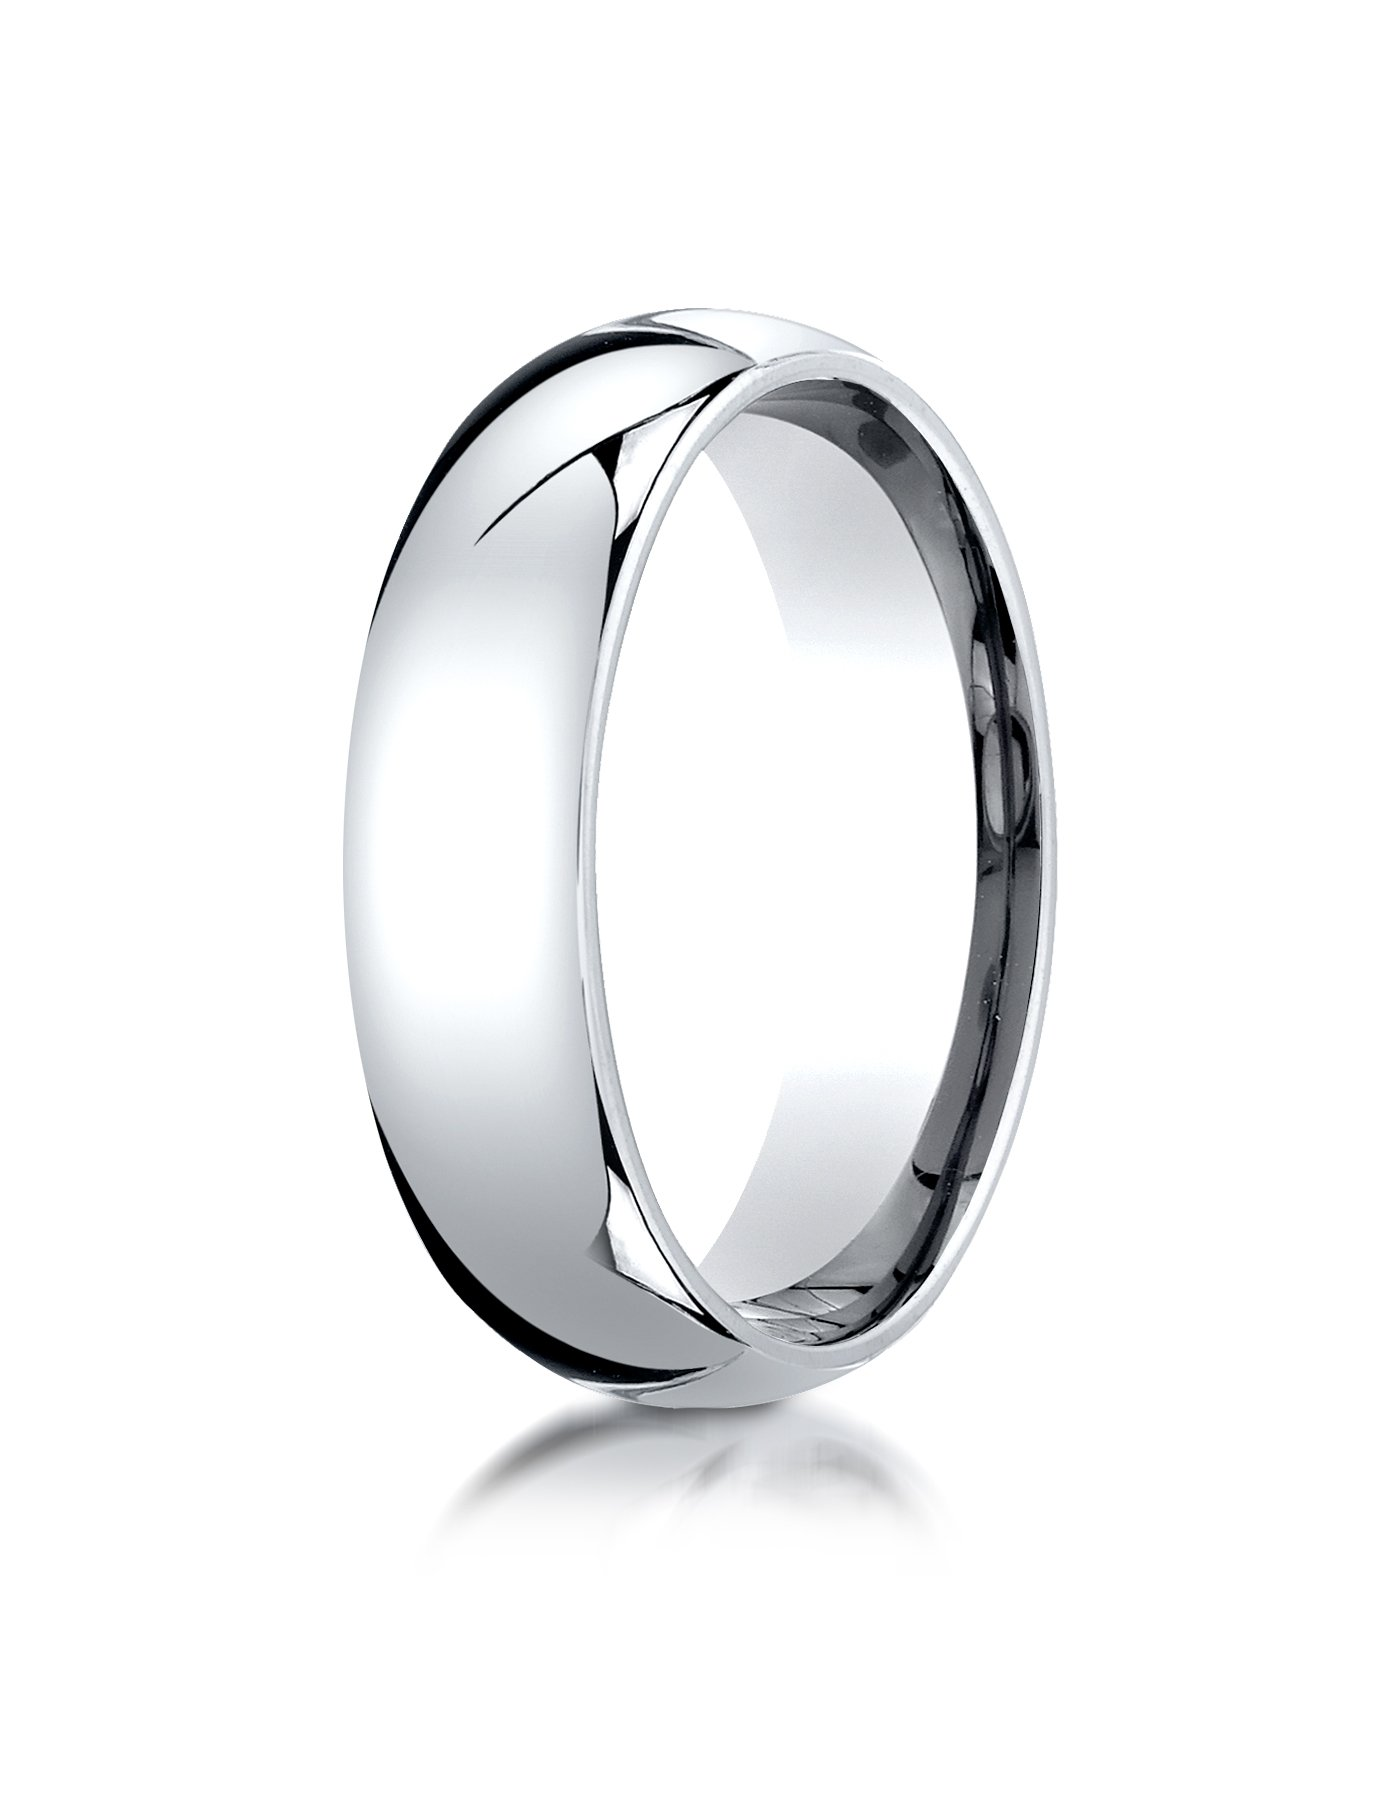 Men's Platinum 6mm Slim Profile Comfort Fit Wedding Band Ring, Size 7.5 by Aetonal